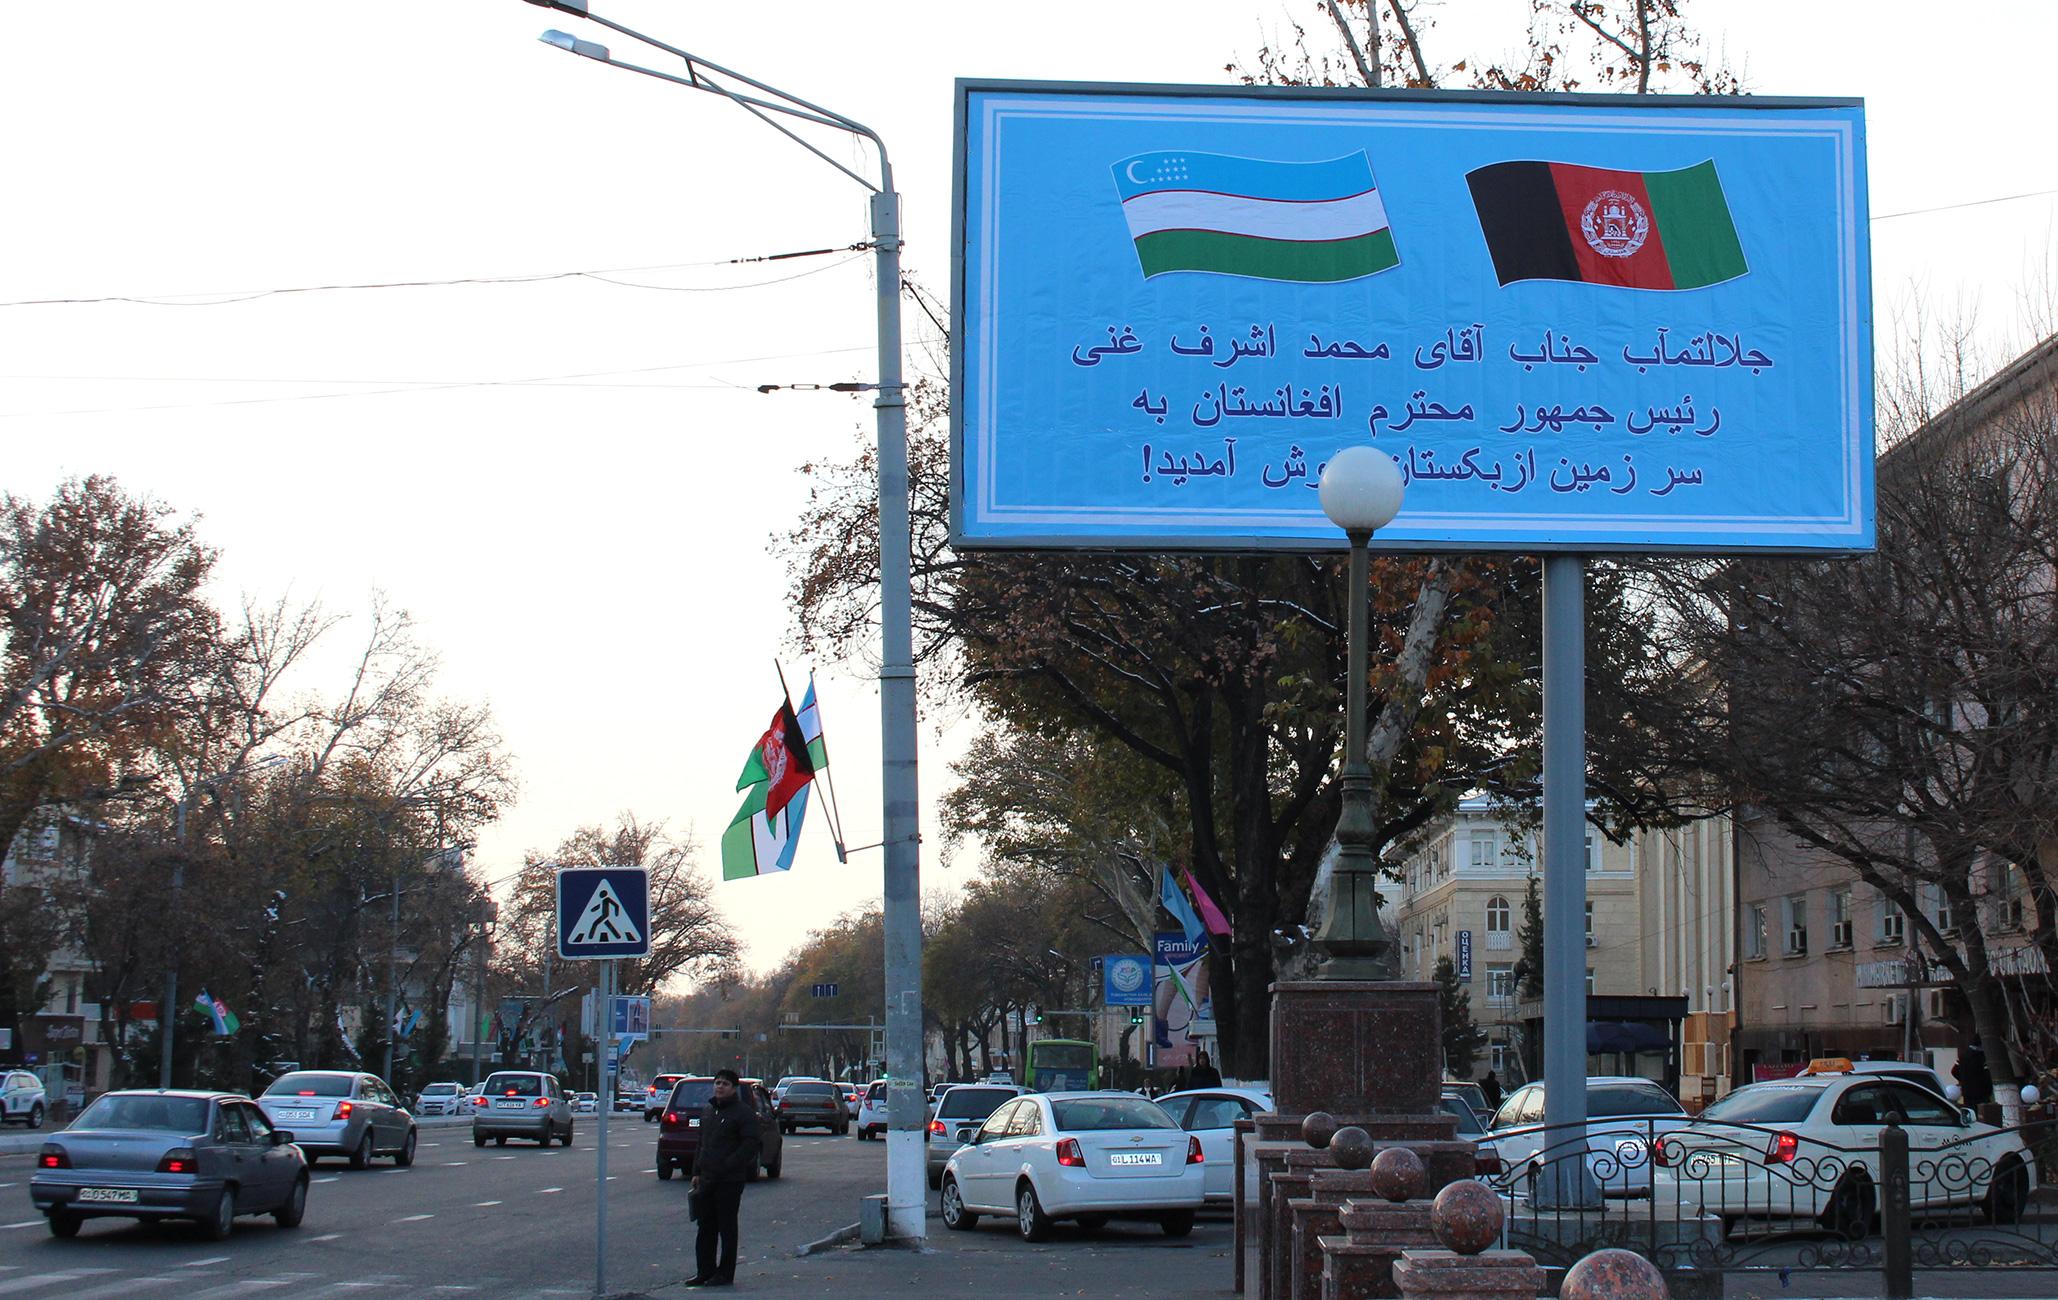 Uzbekistan, Afghanistan enter 'new stage of co-operation'